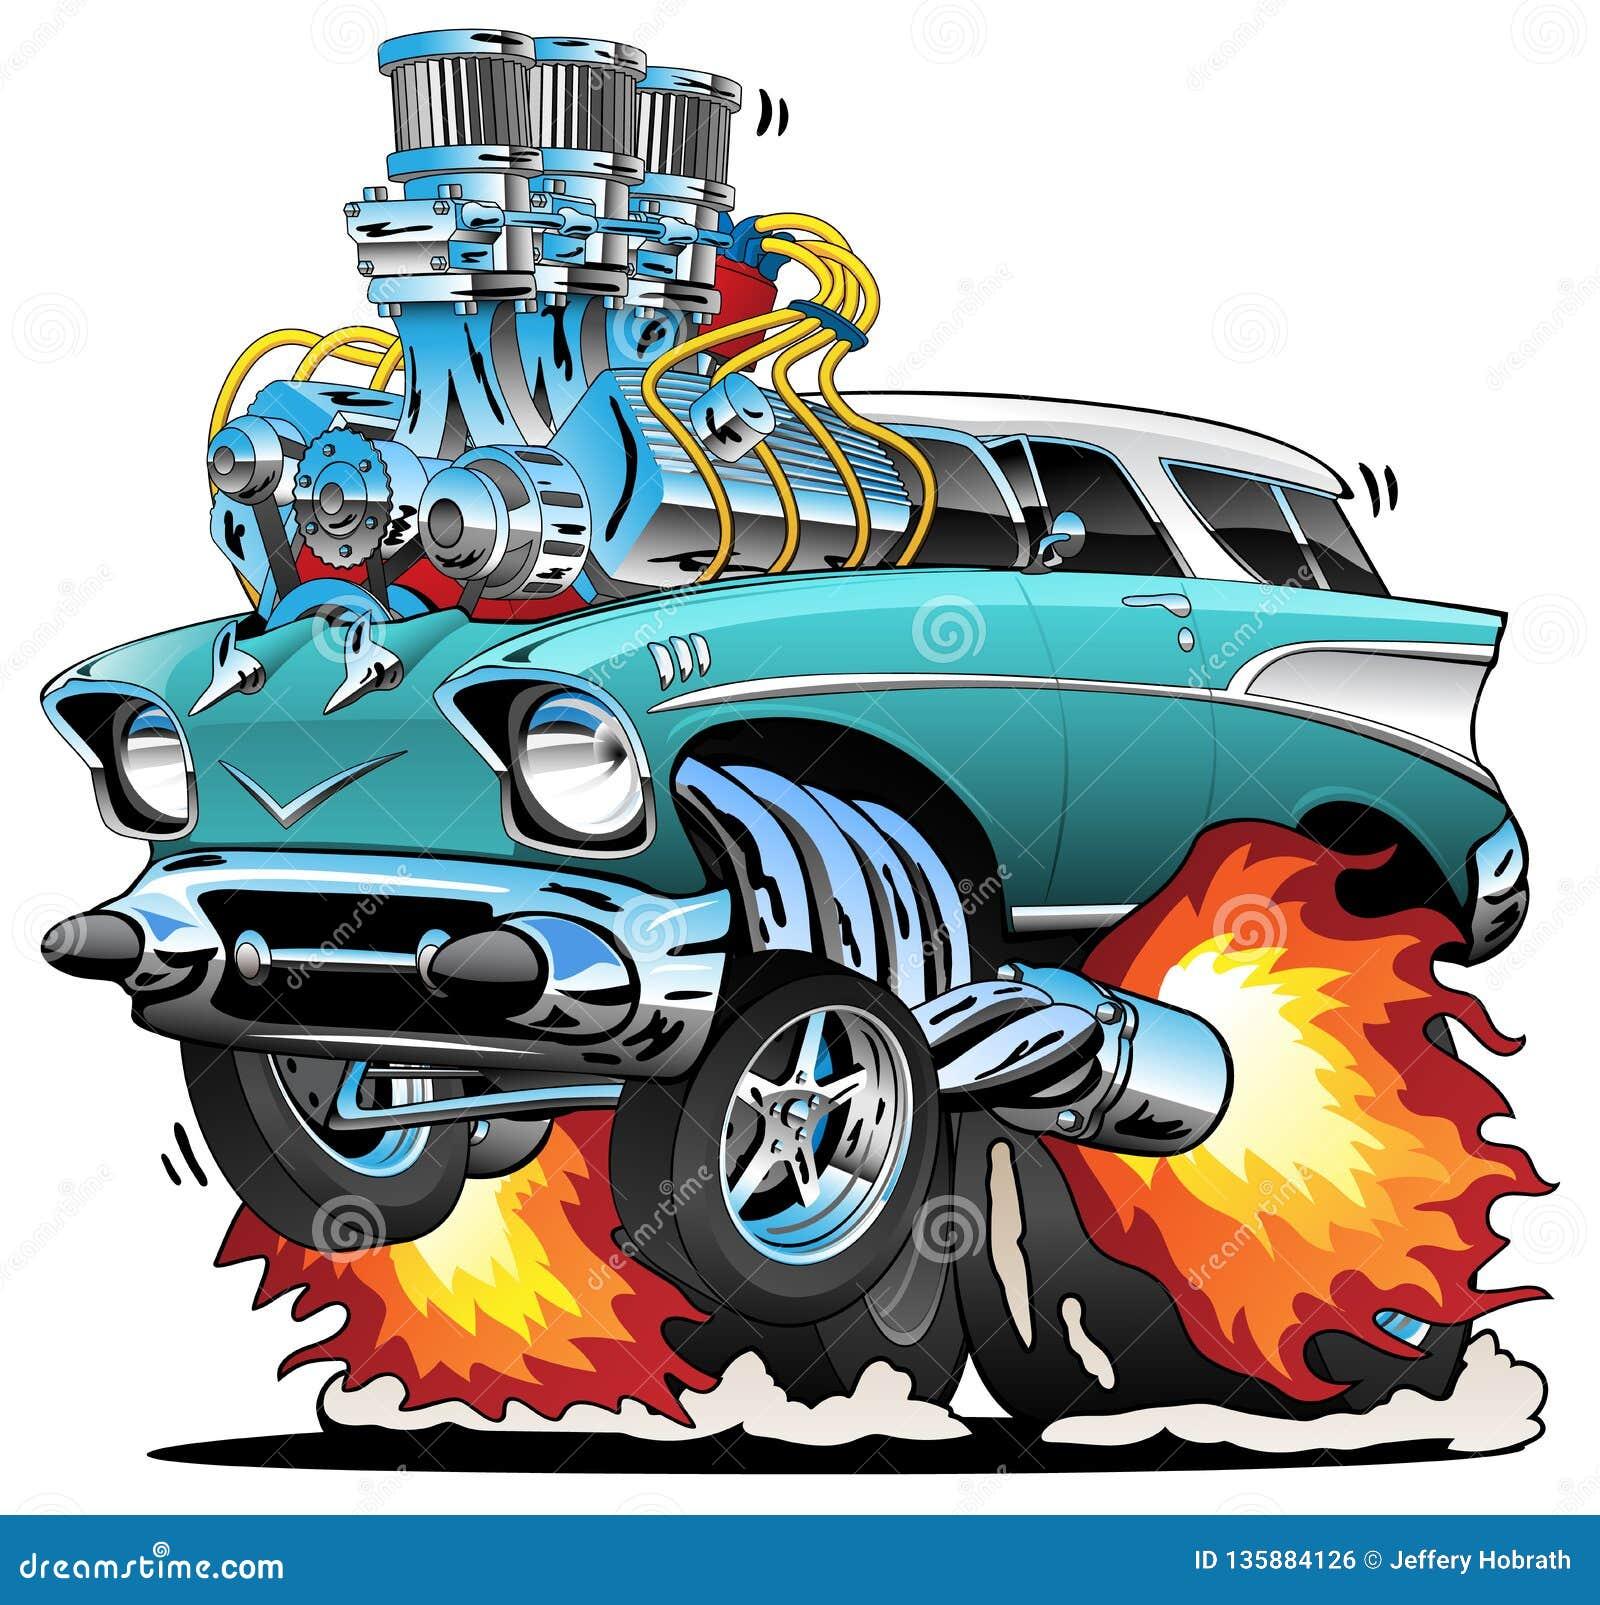 Classic Fifties Hot Rod Muscle Car Cartoon Vector Illustration